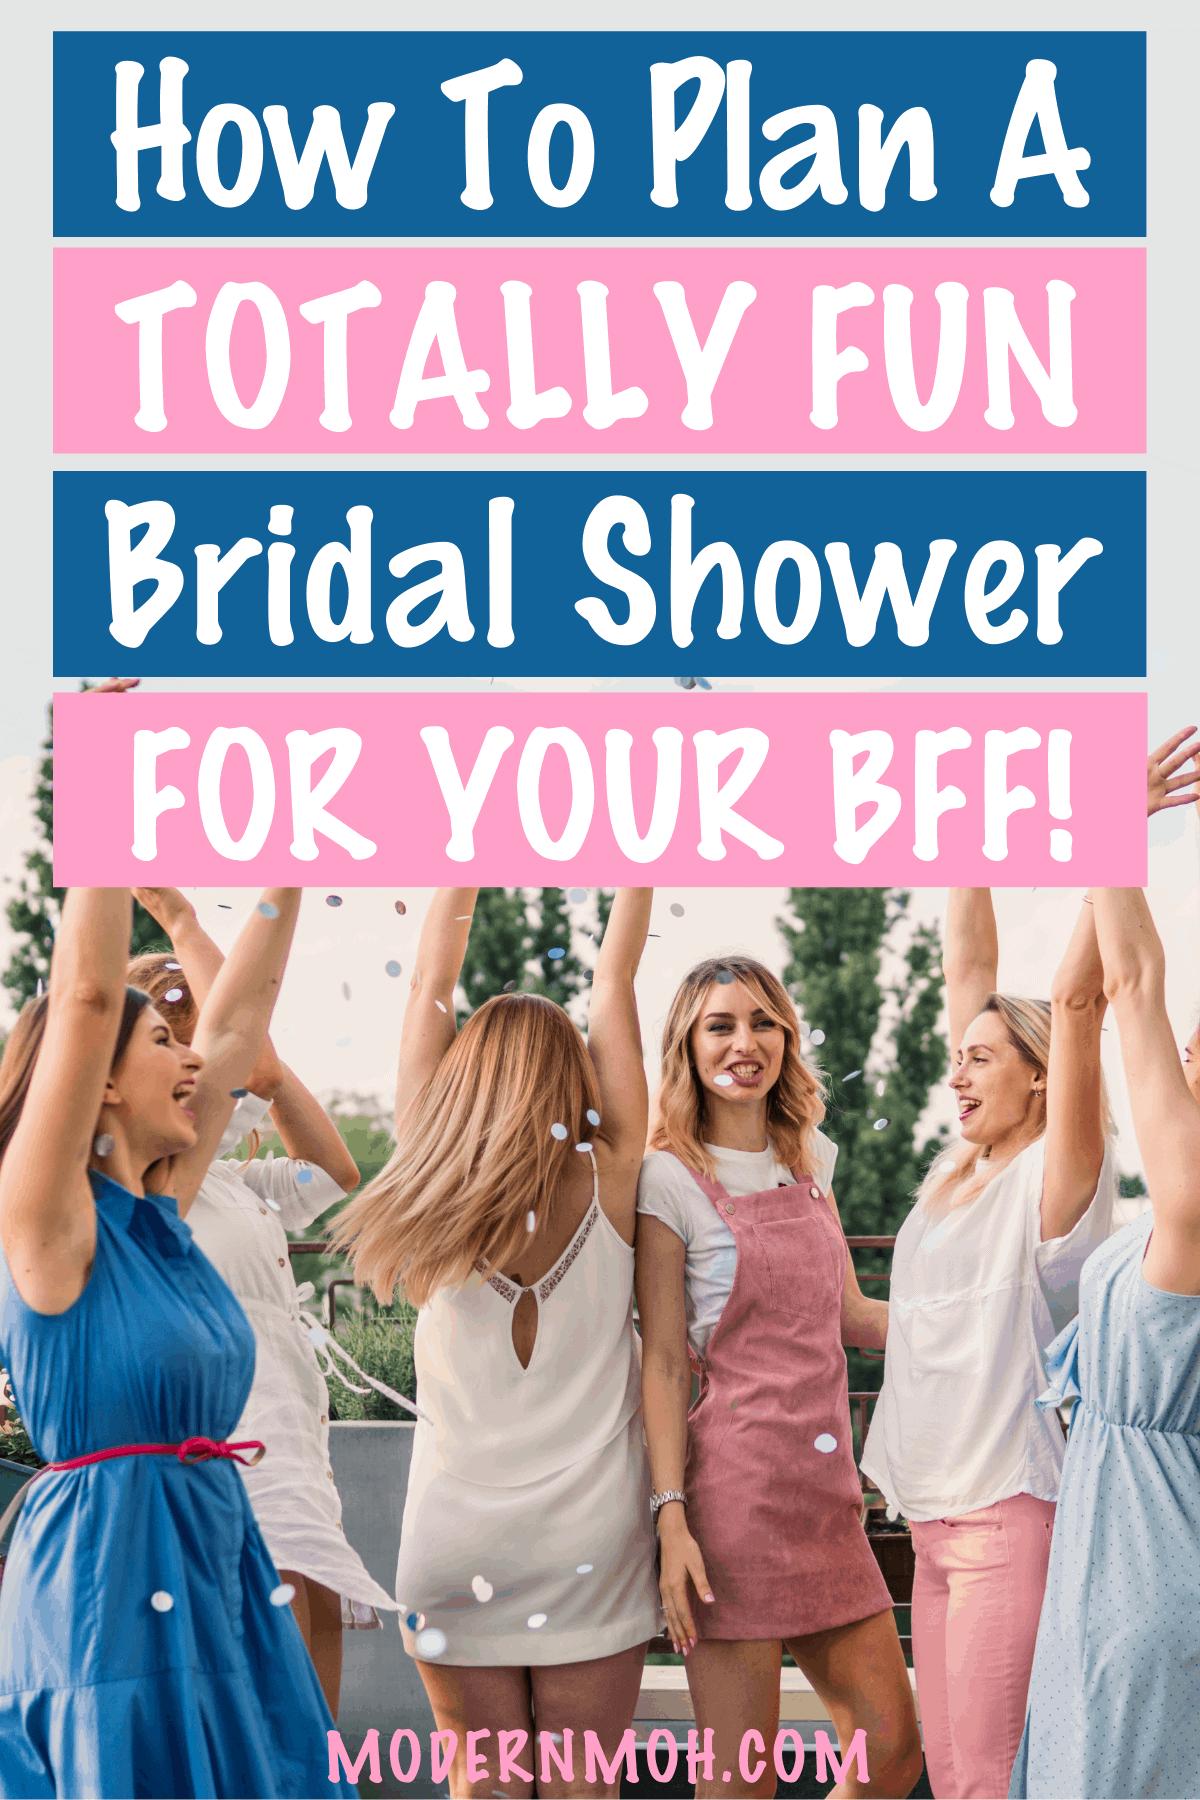 Bridal Shower Planning Checklist and Etiquette Tips